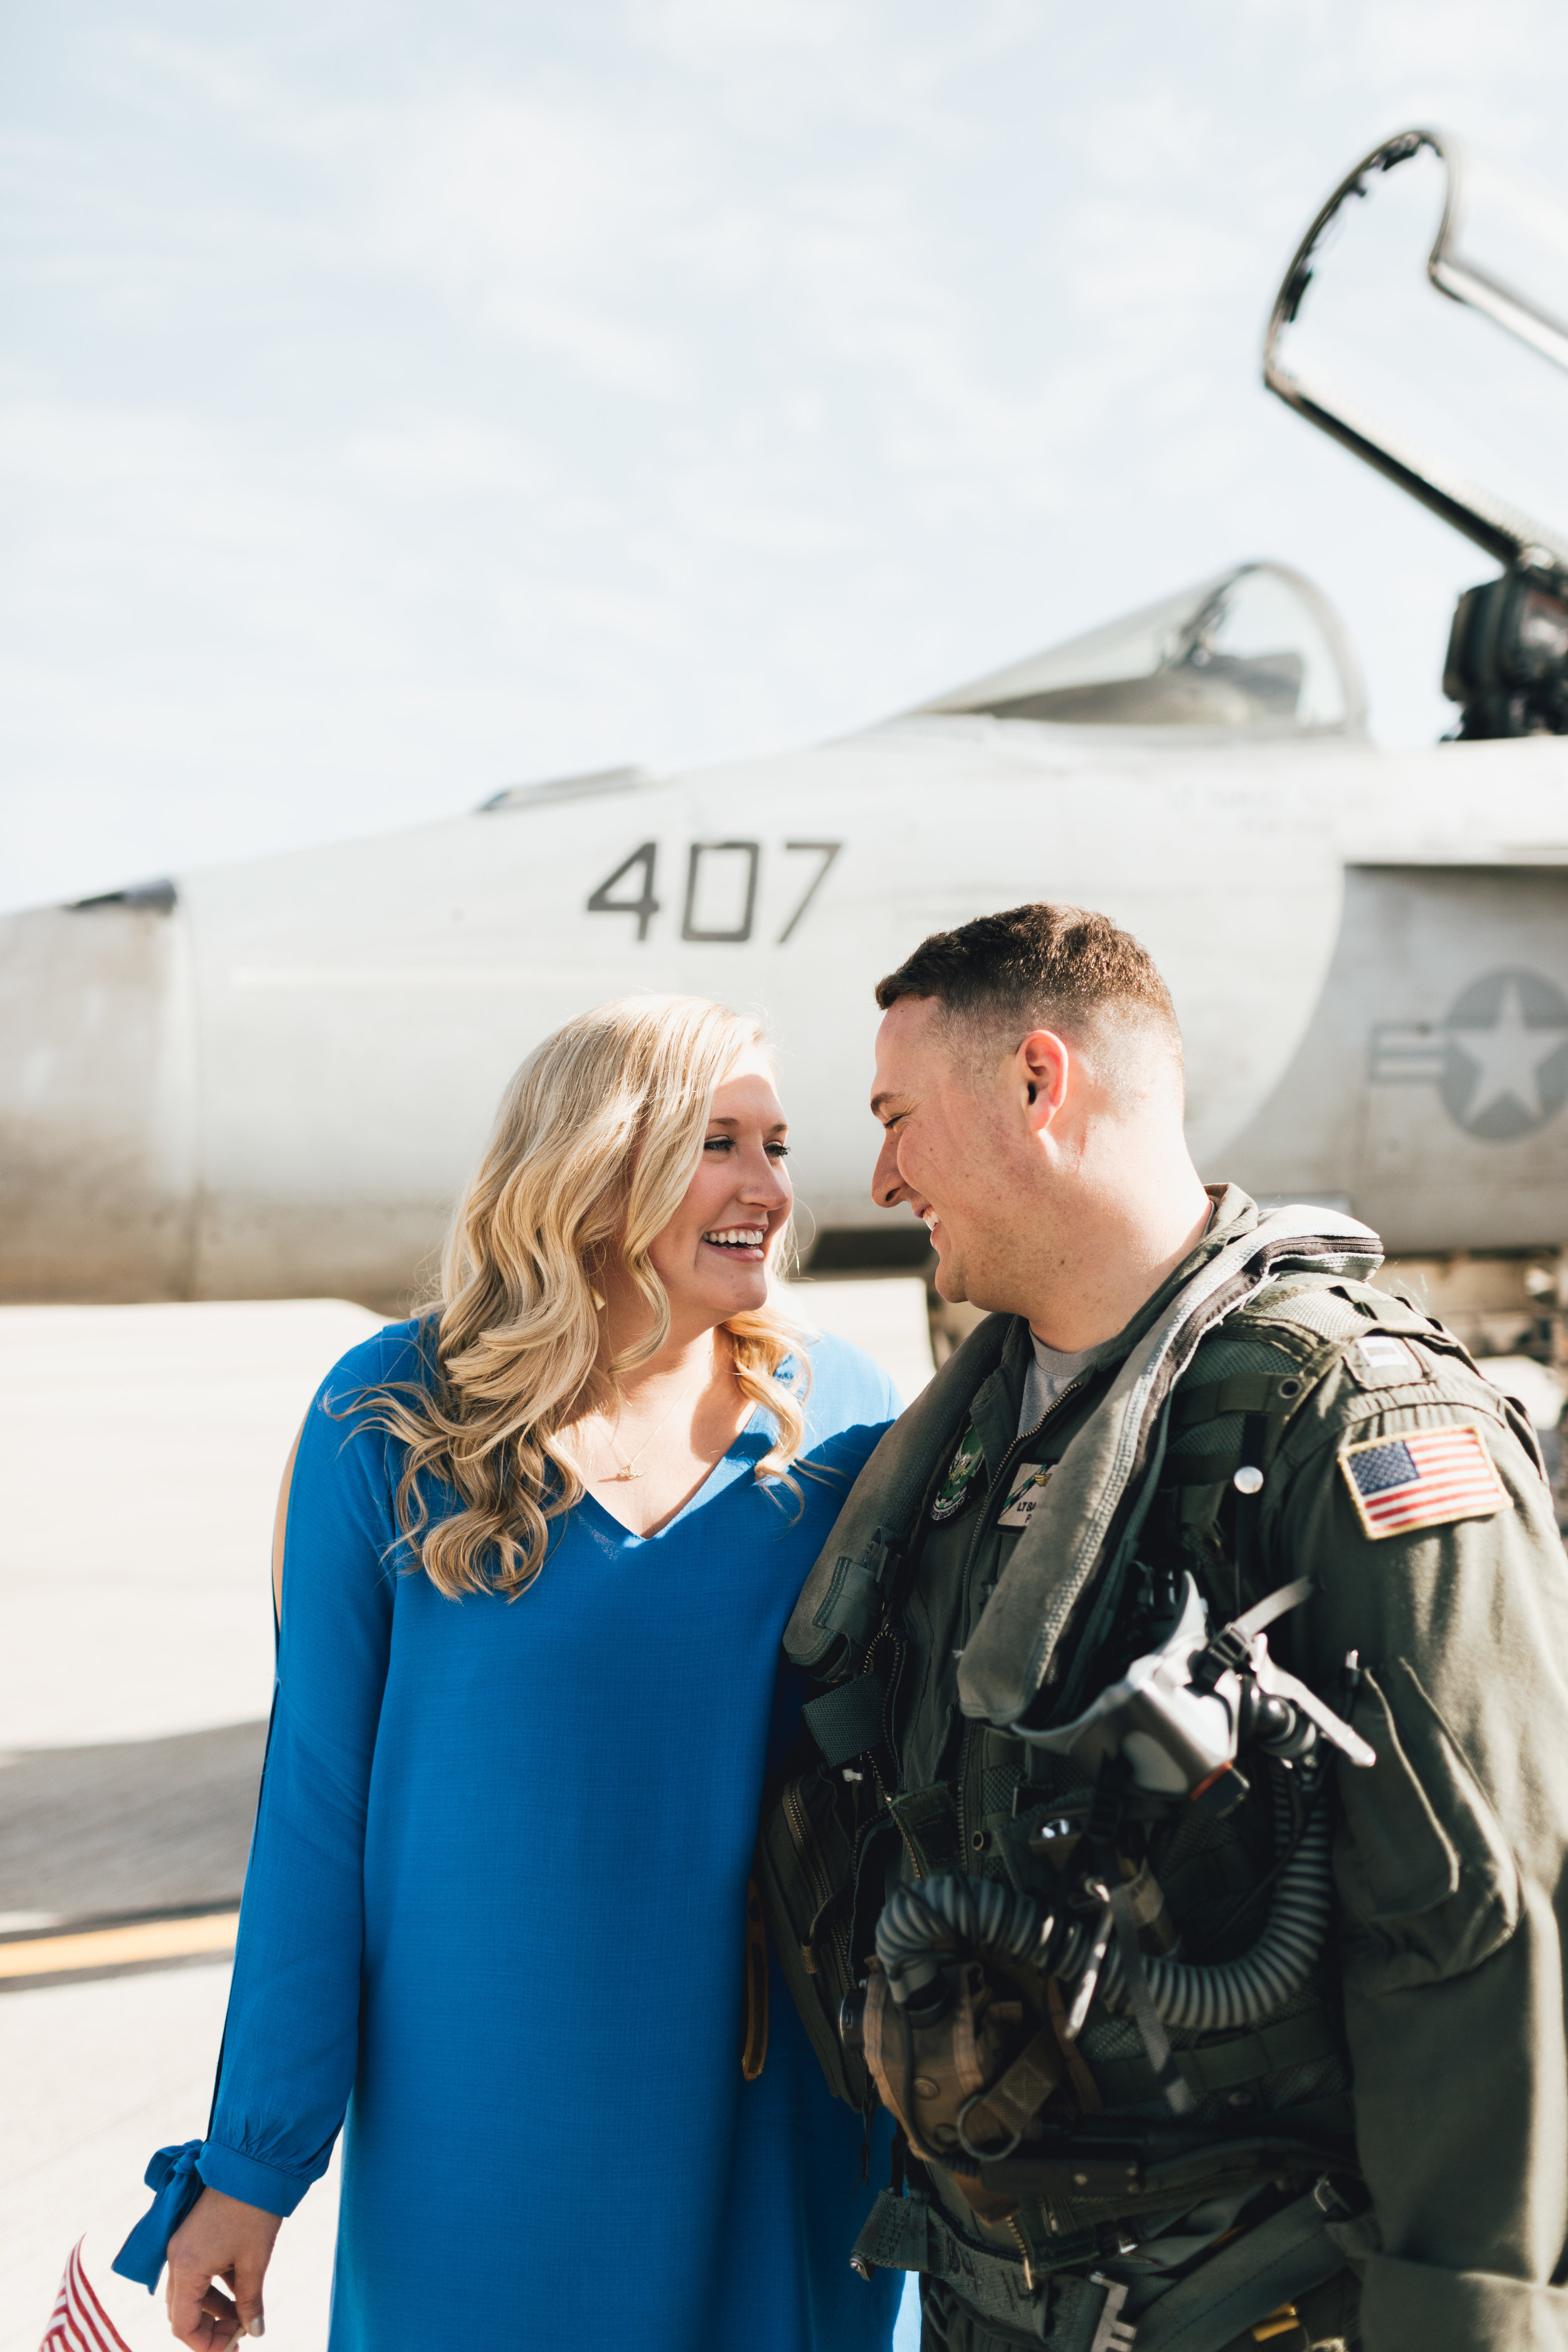 military-homecoming-photo-by-samantha-look.jpg